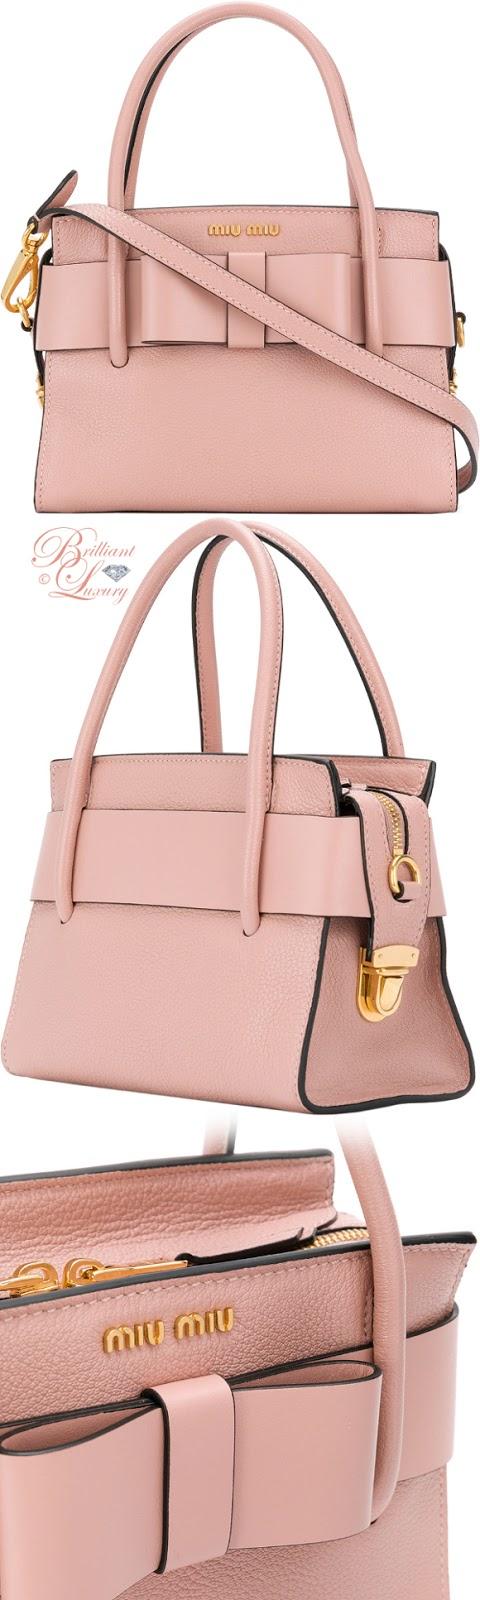 Brilliant Luxury ♦ Miu Miu bow detail mini tote bag